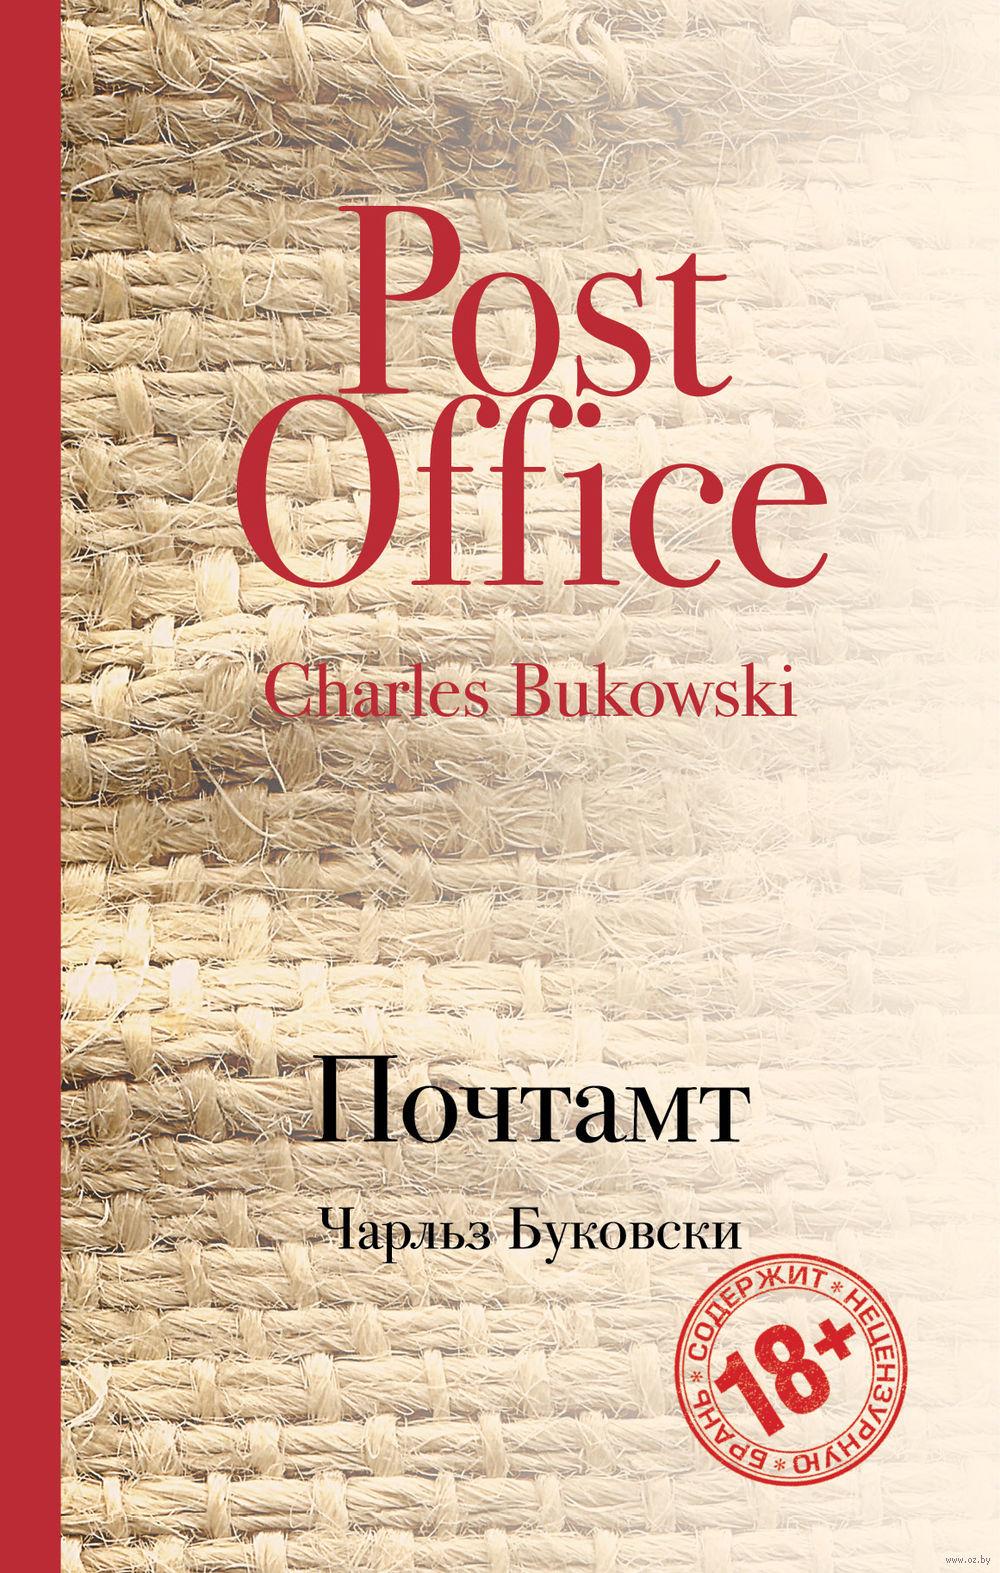 Купить Почтамт, Чарльз Буковски, 978-5-699-90892-9